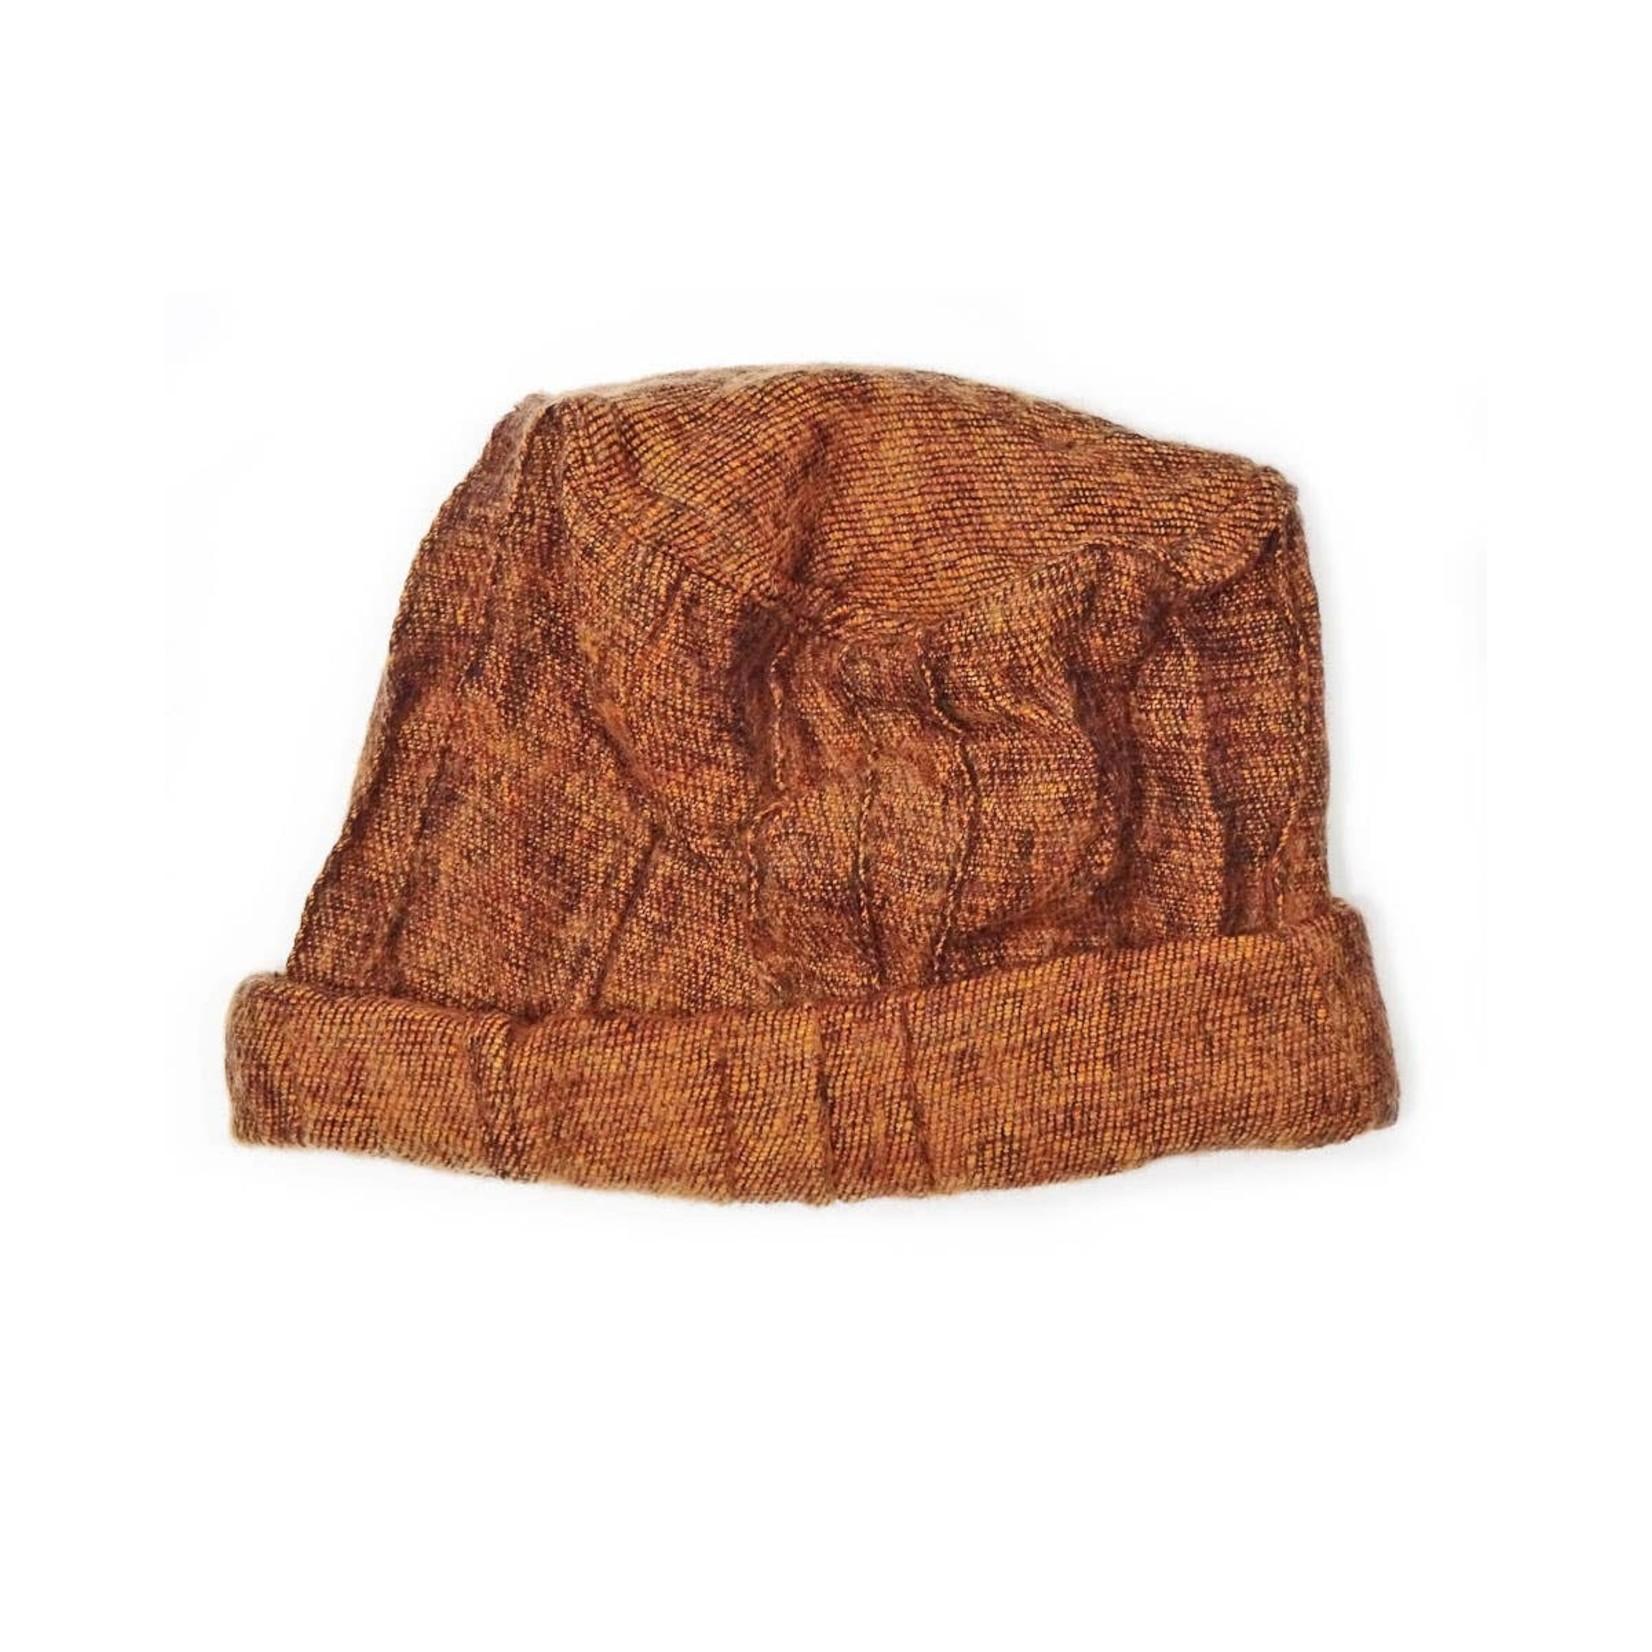 Zig Zag Asian Brushed Woven Pashtun Hat in Cinnamon